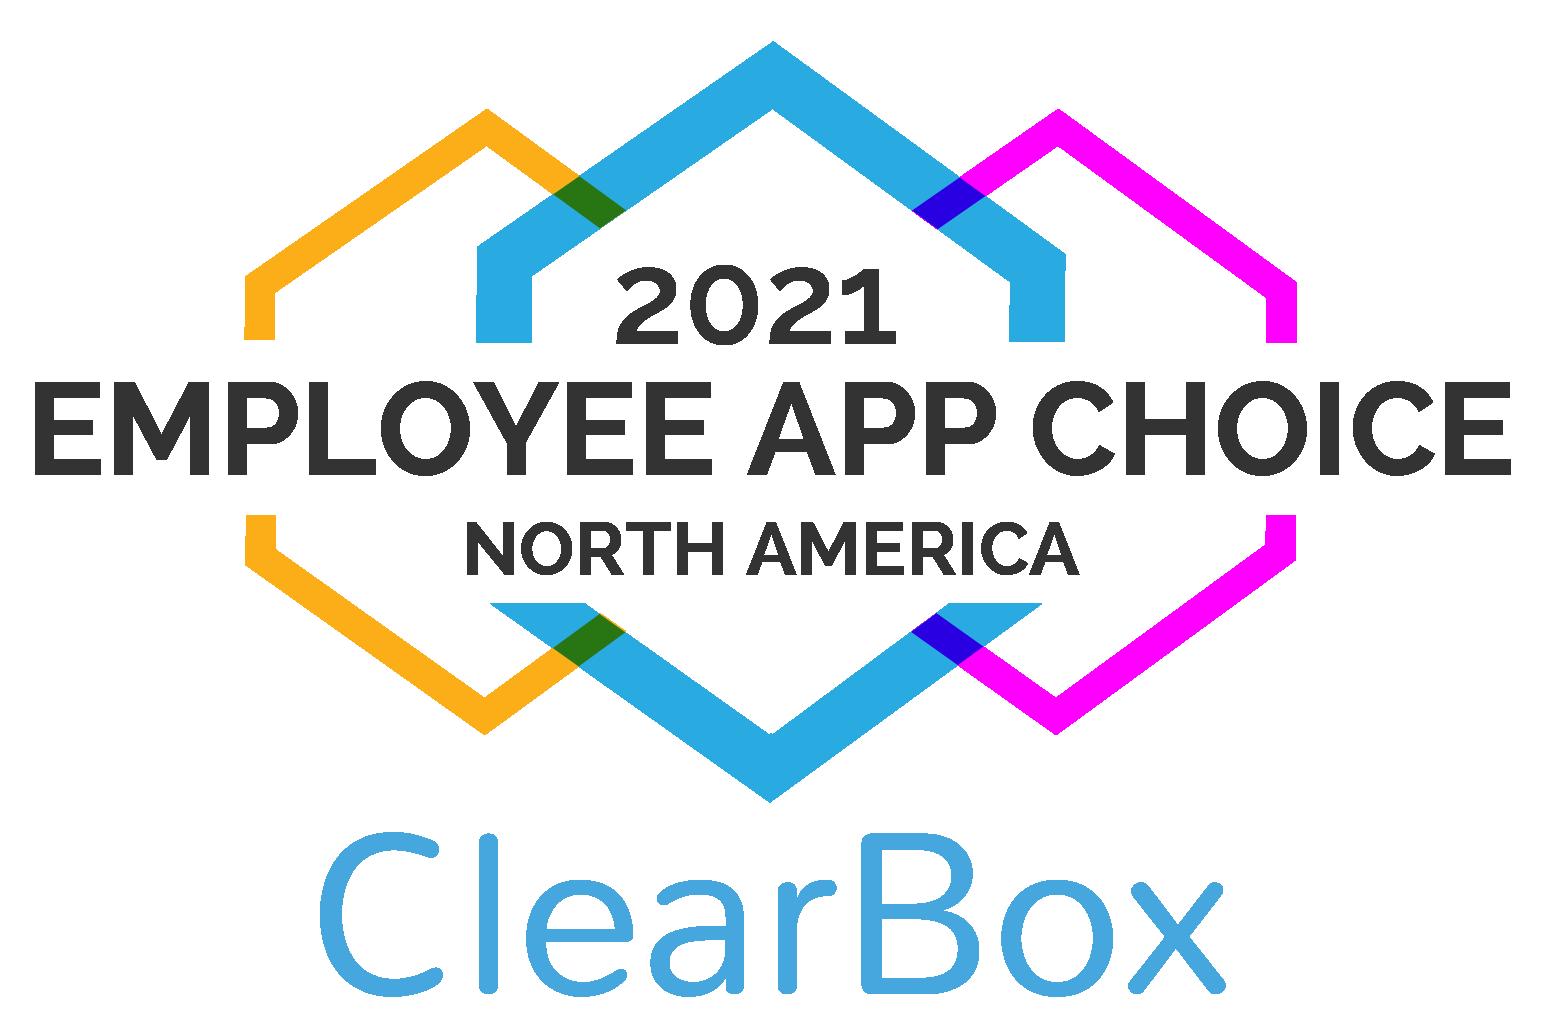 employee app choice North America 2021.